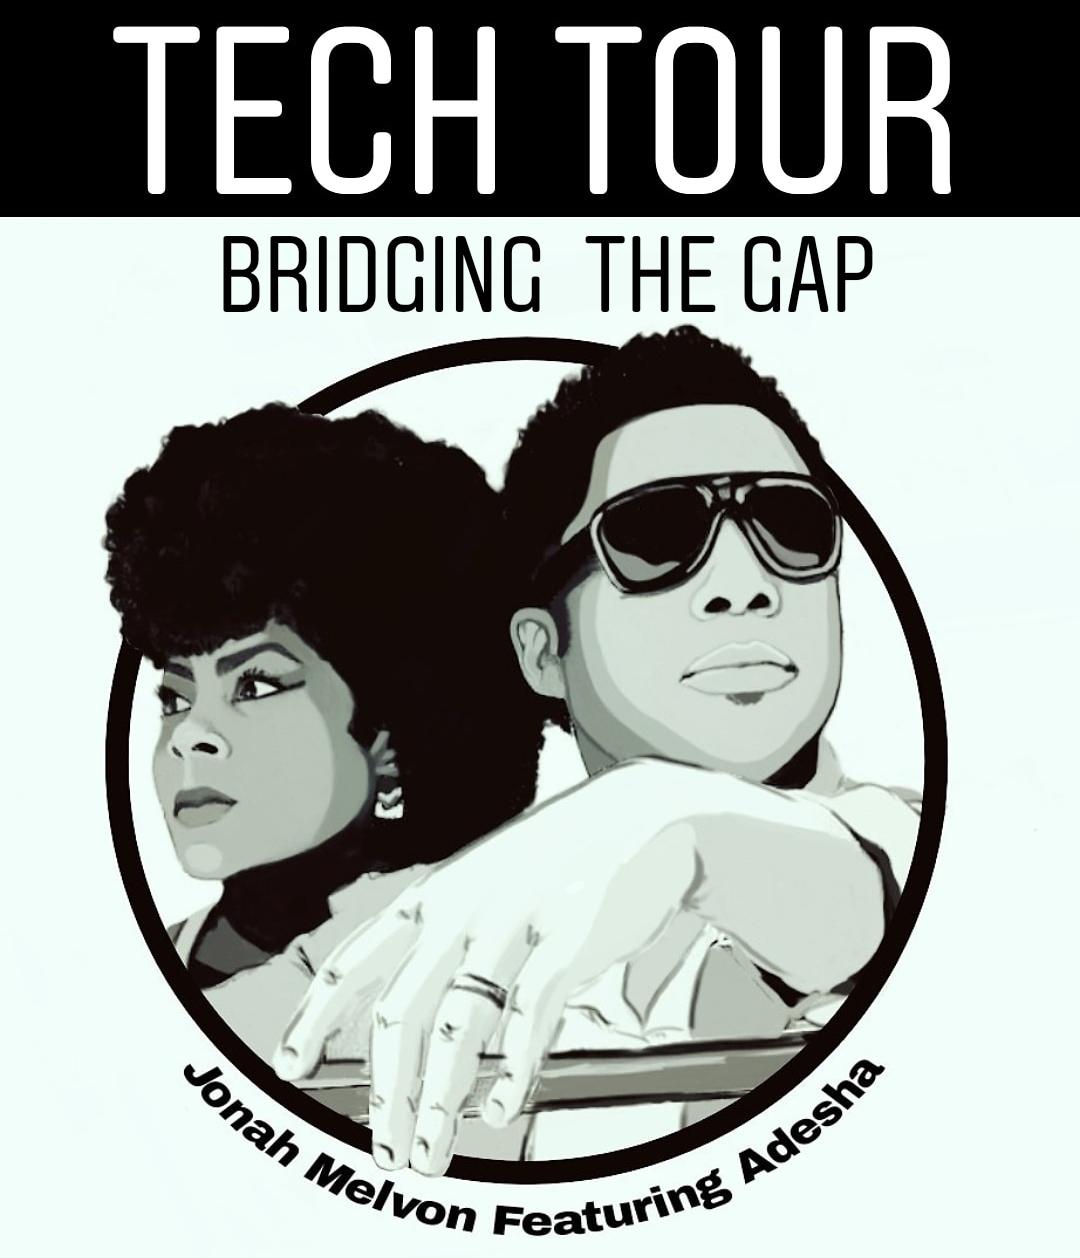 Tech Tour - Bridging the gap through music.